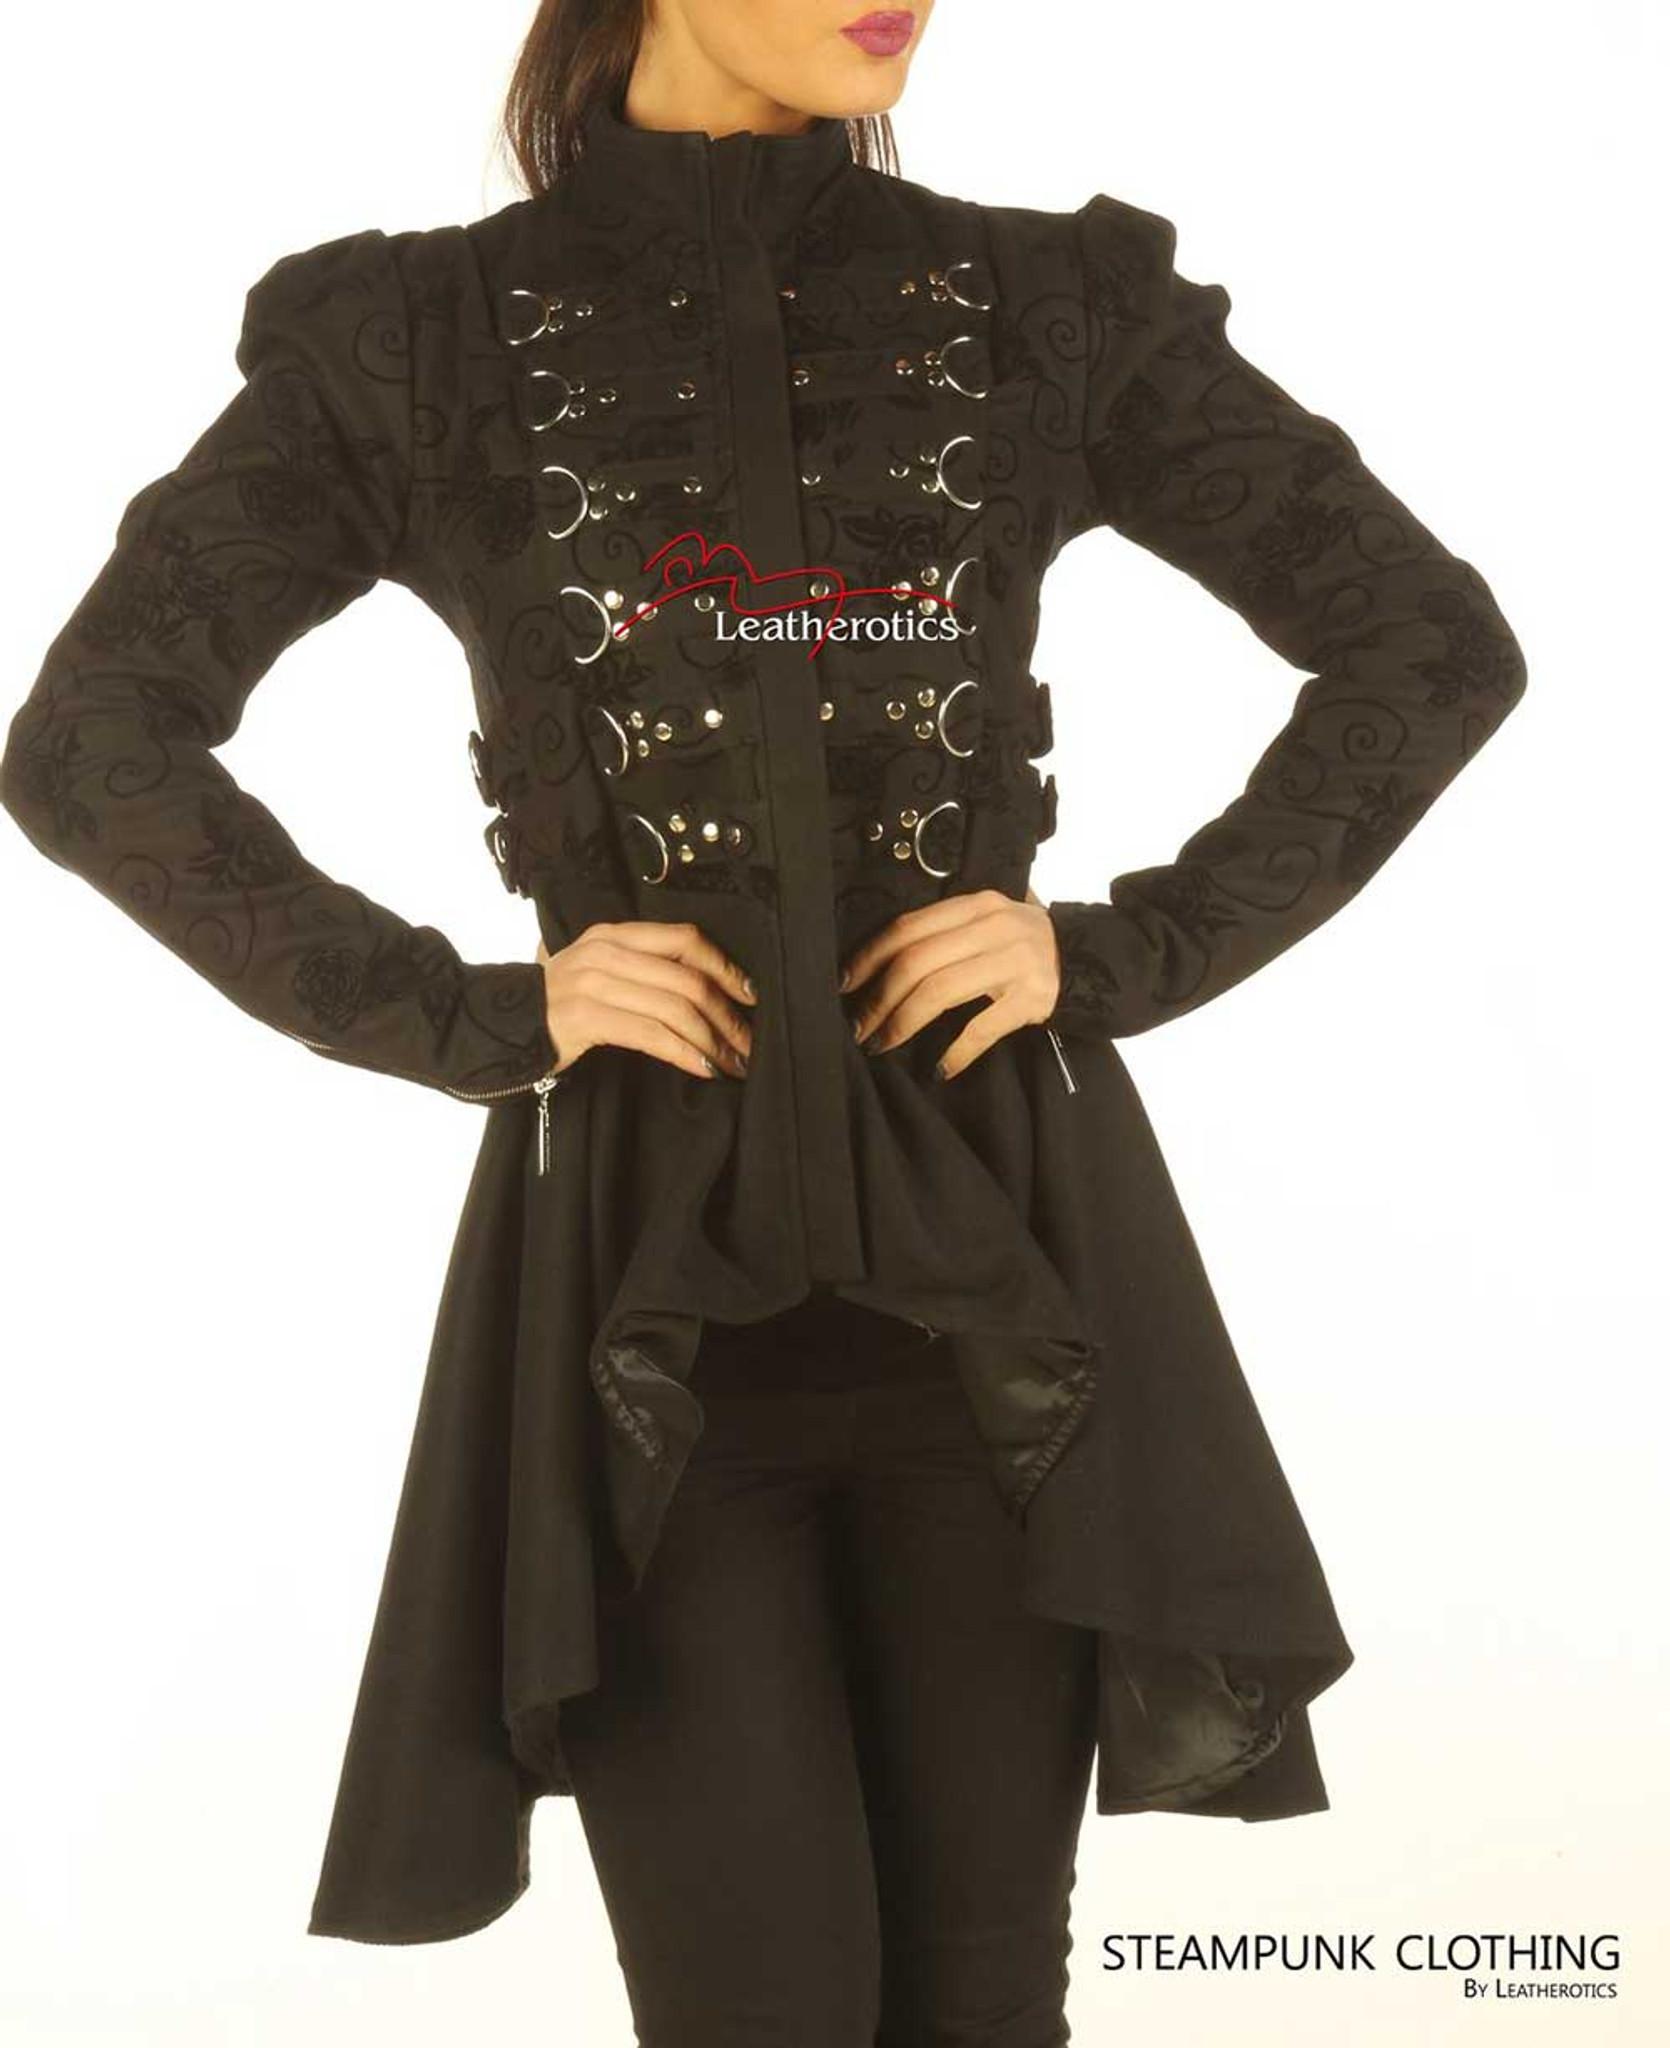 a9979d3e Black Cotton Steampunk Ladies Top Cyber Gothic Jacket ST6